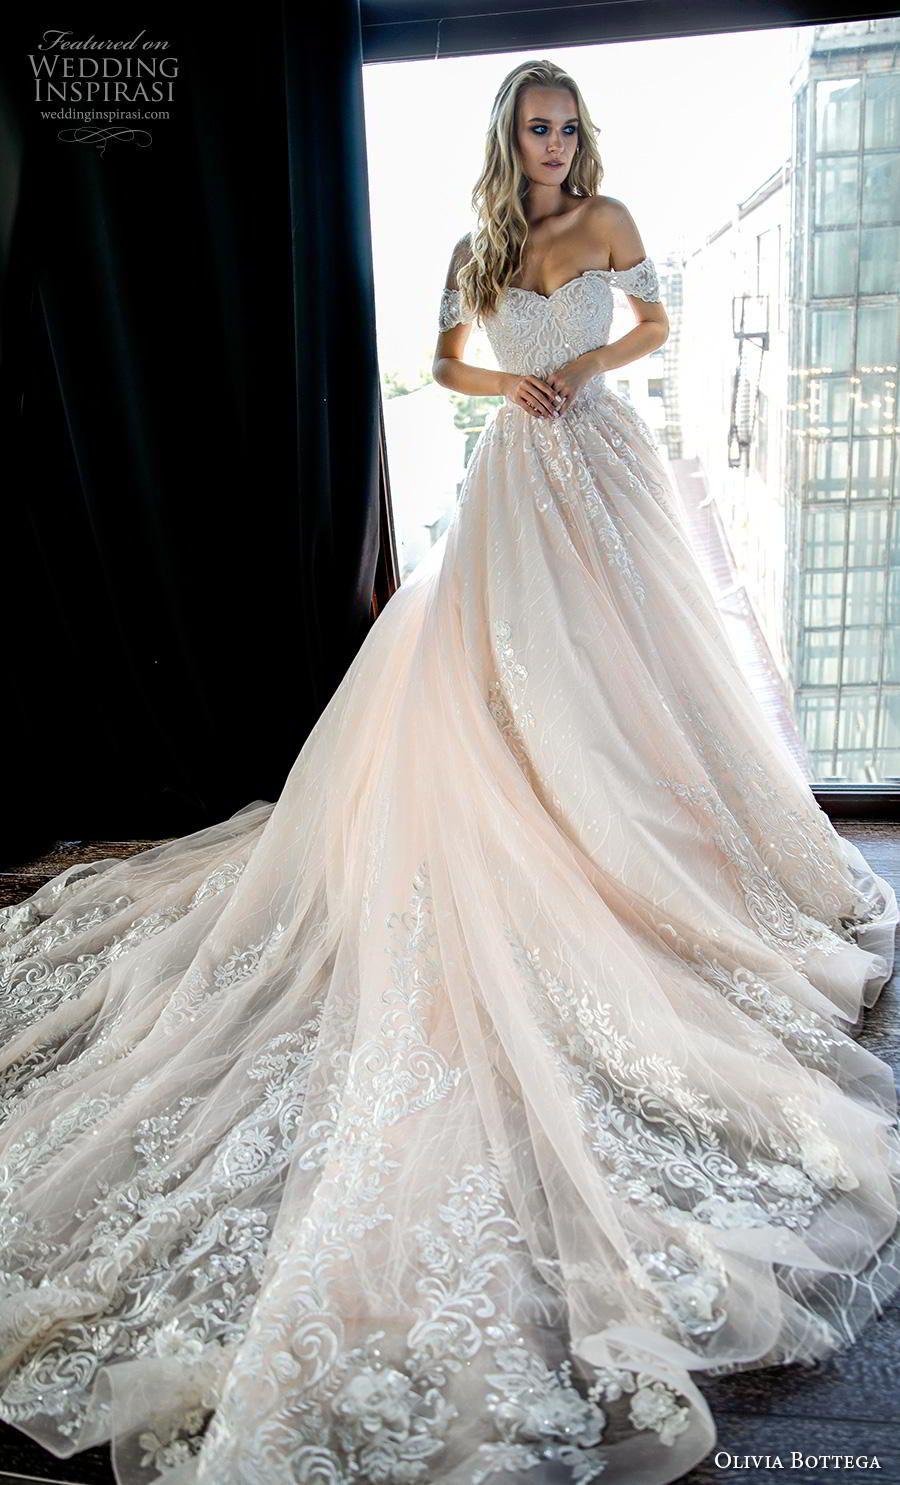 Olivia Bottega 2019 Wedding Dresses Wedding Inspirasi Princess Wedding Dresses Dream Wedding Dresses A Line Wedding Dress [ 1485 x 900 Pixel ]